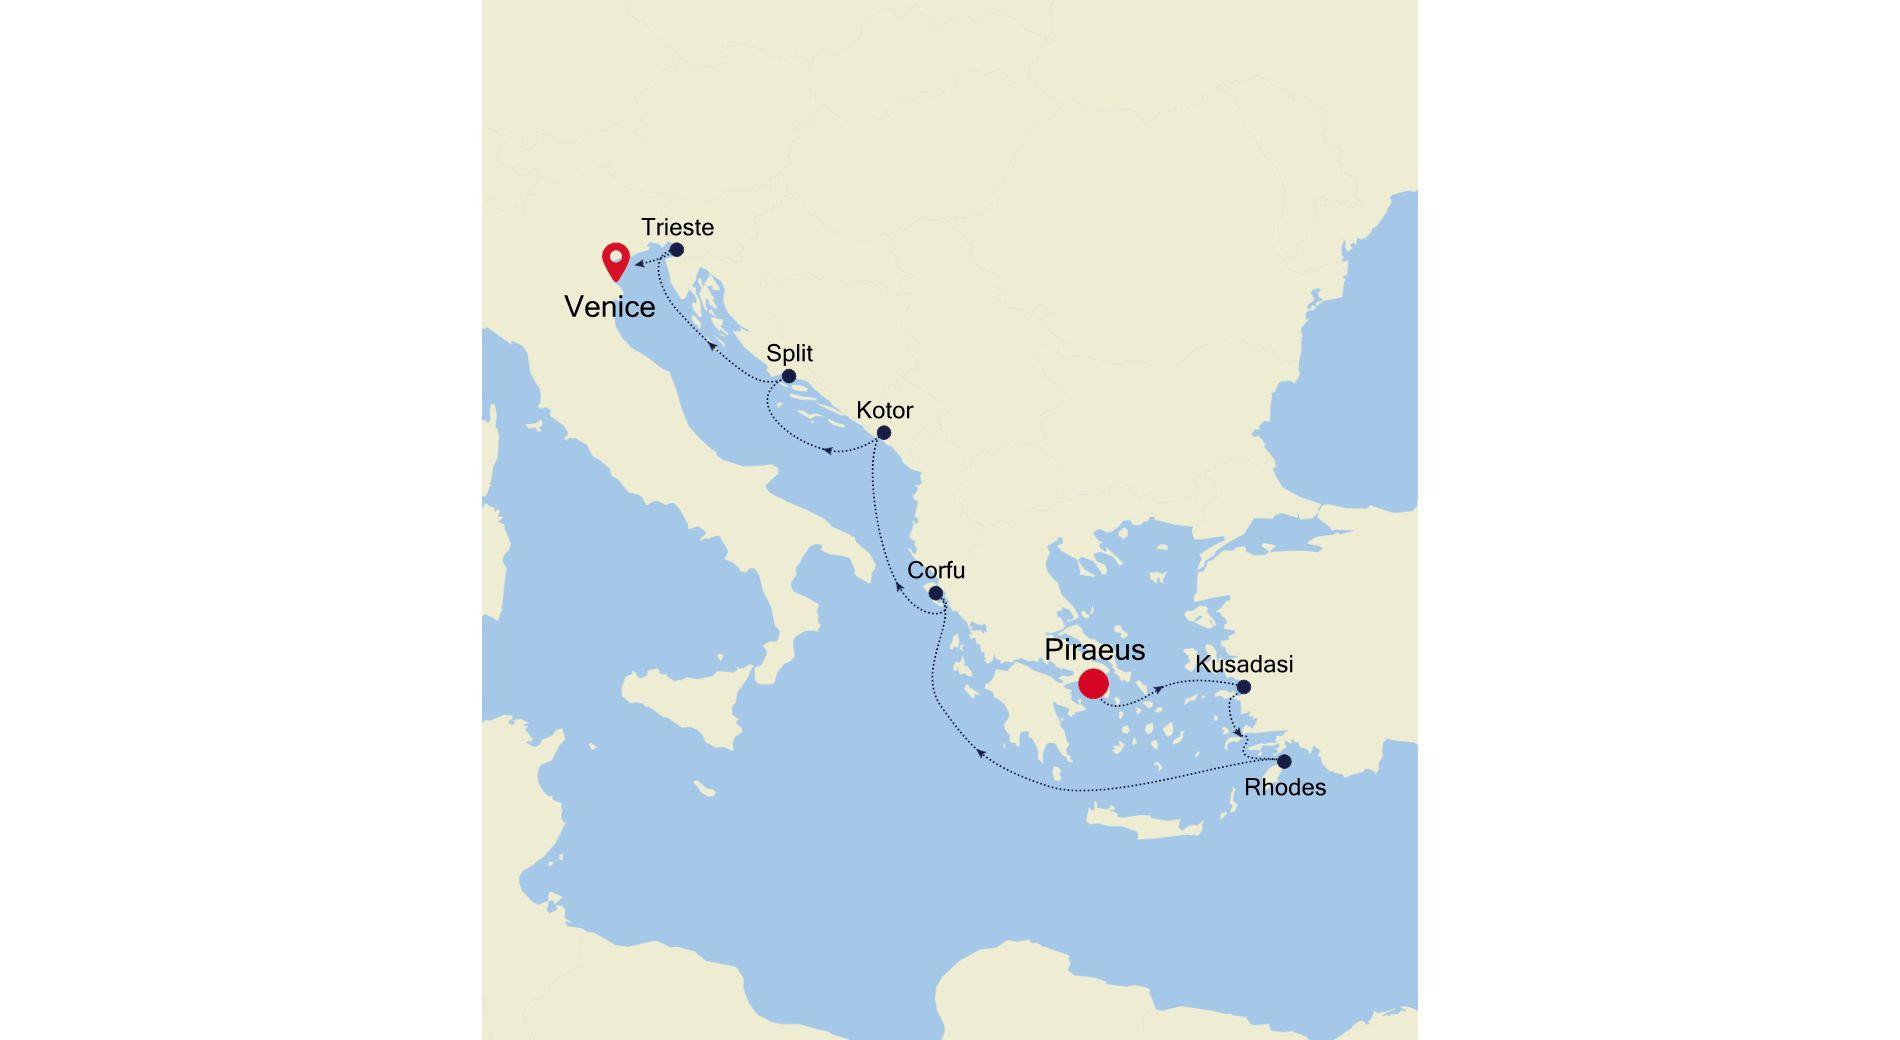 MO210413009 - Piraeus to Venice